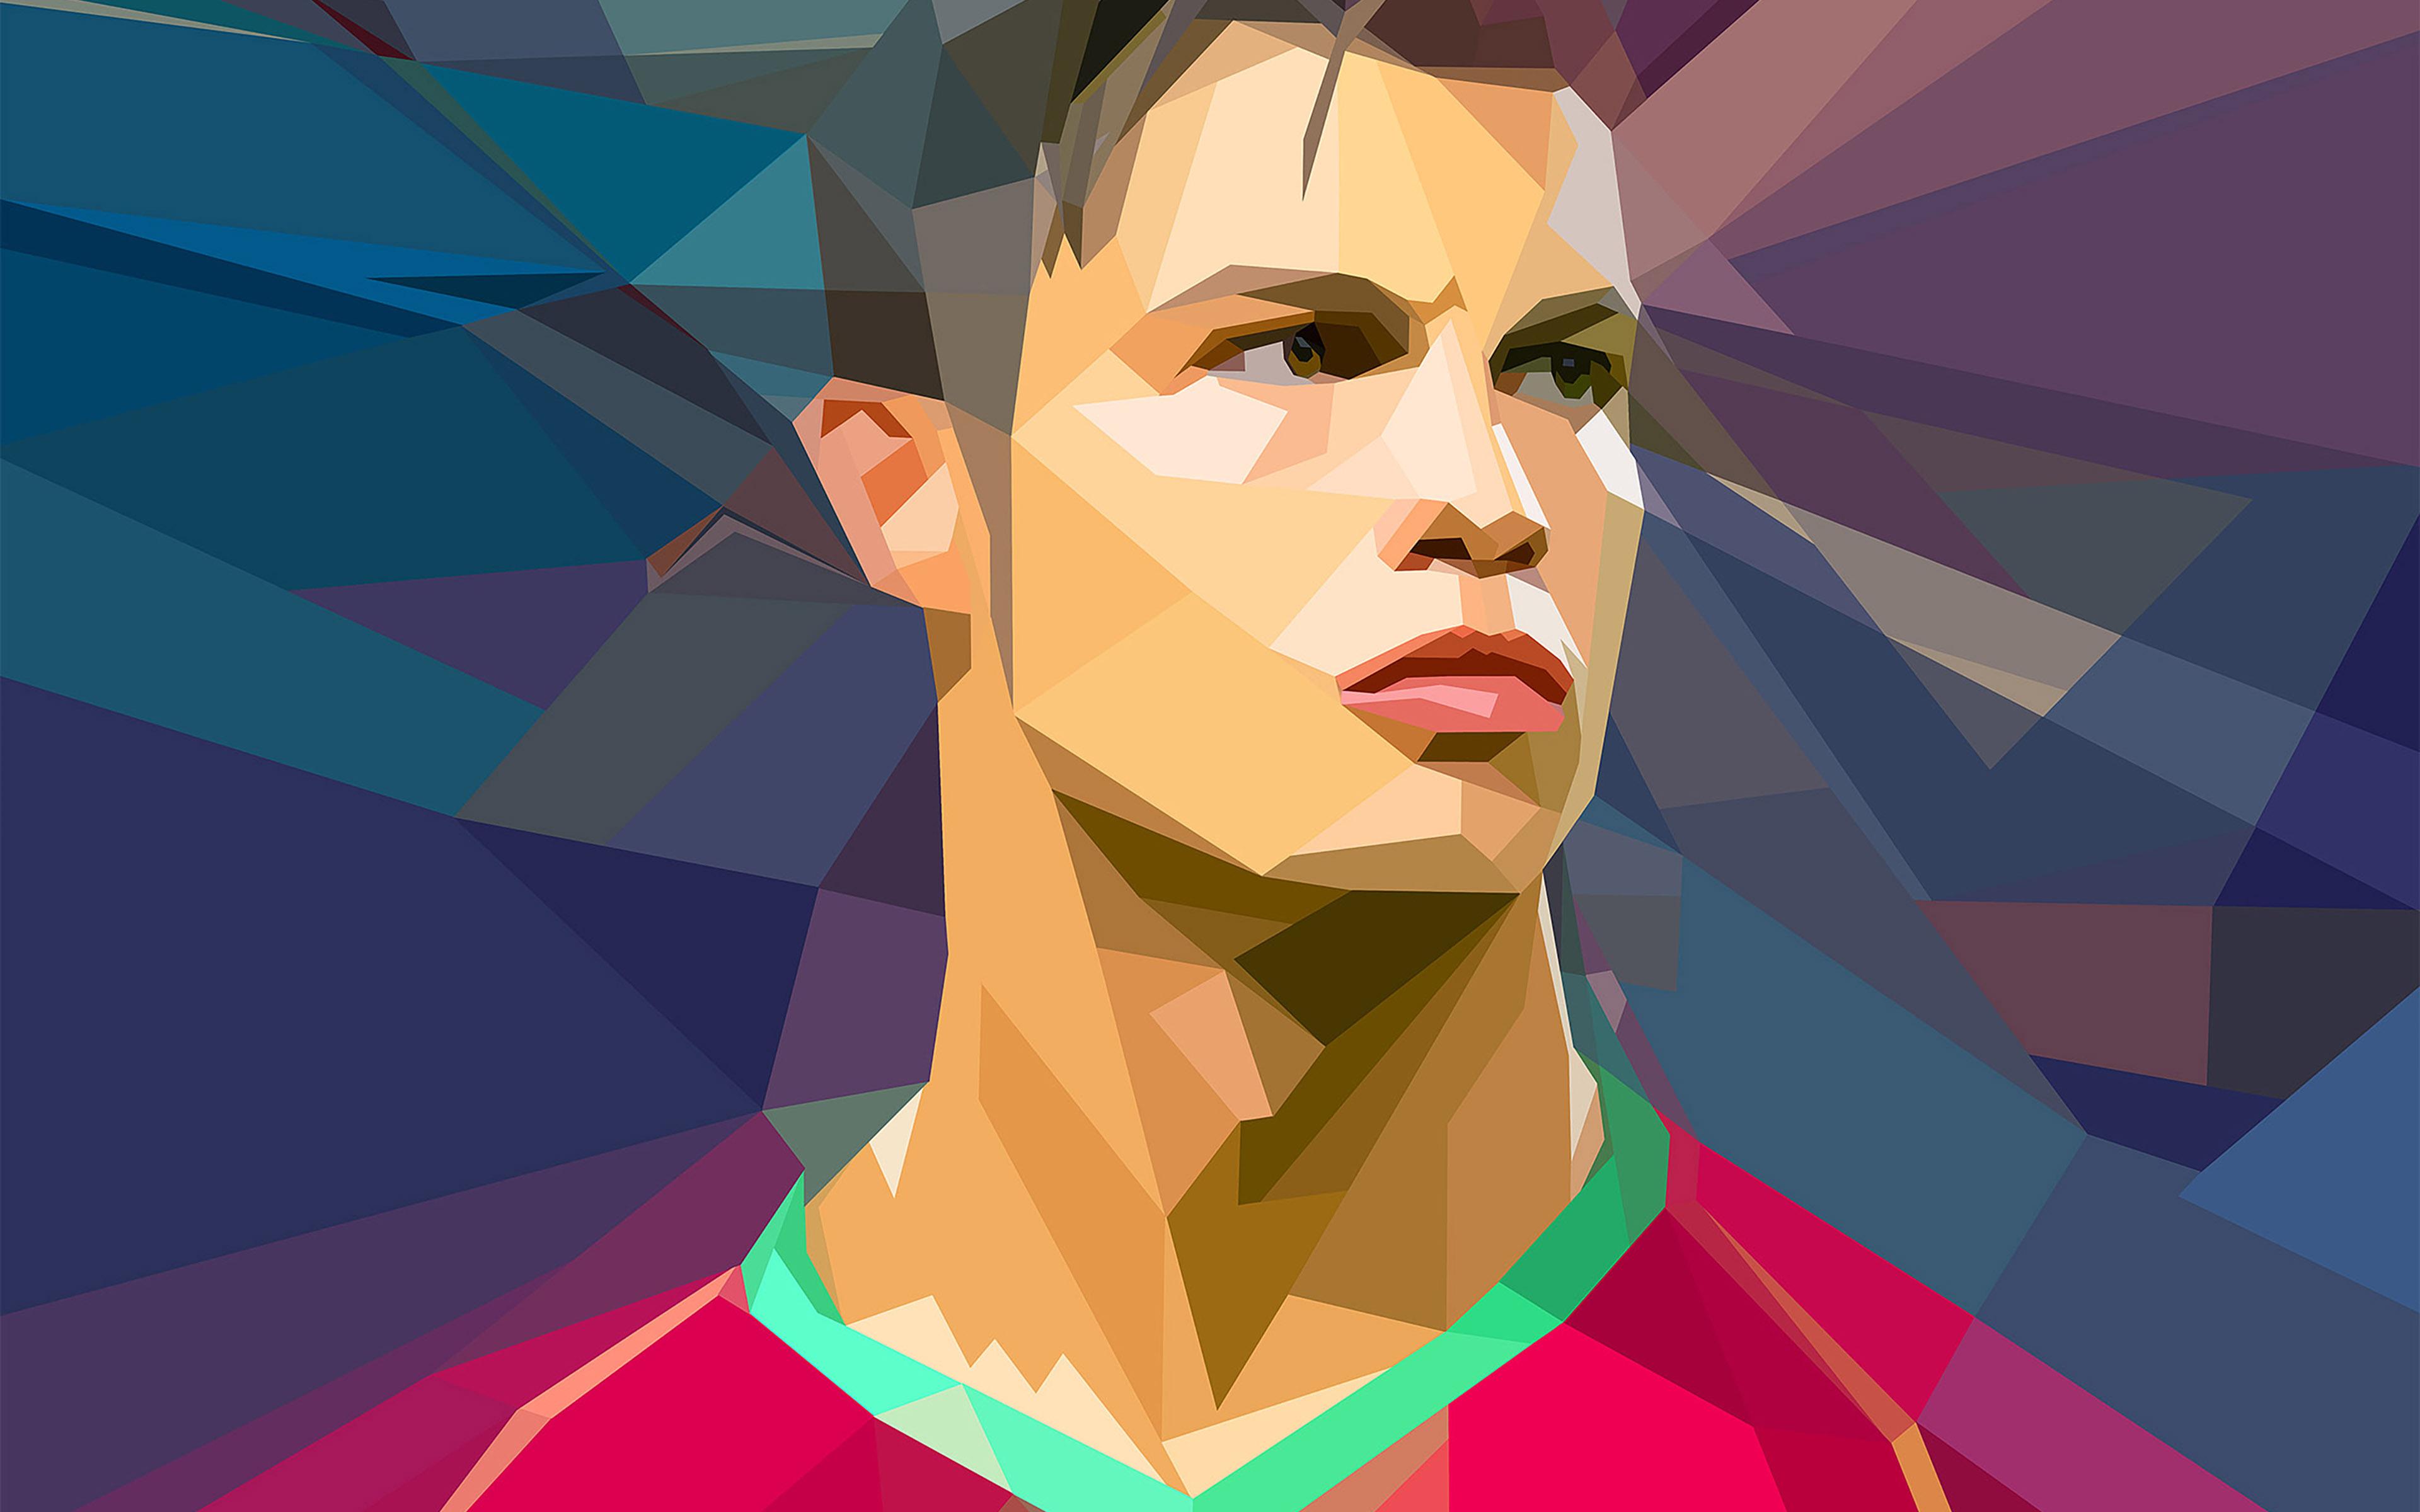 Soccer Iphone X Wallpaper Ac47 Wallpaper C Ronaldo Illust Art Soccer Sports Papers Co